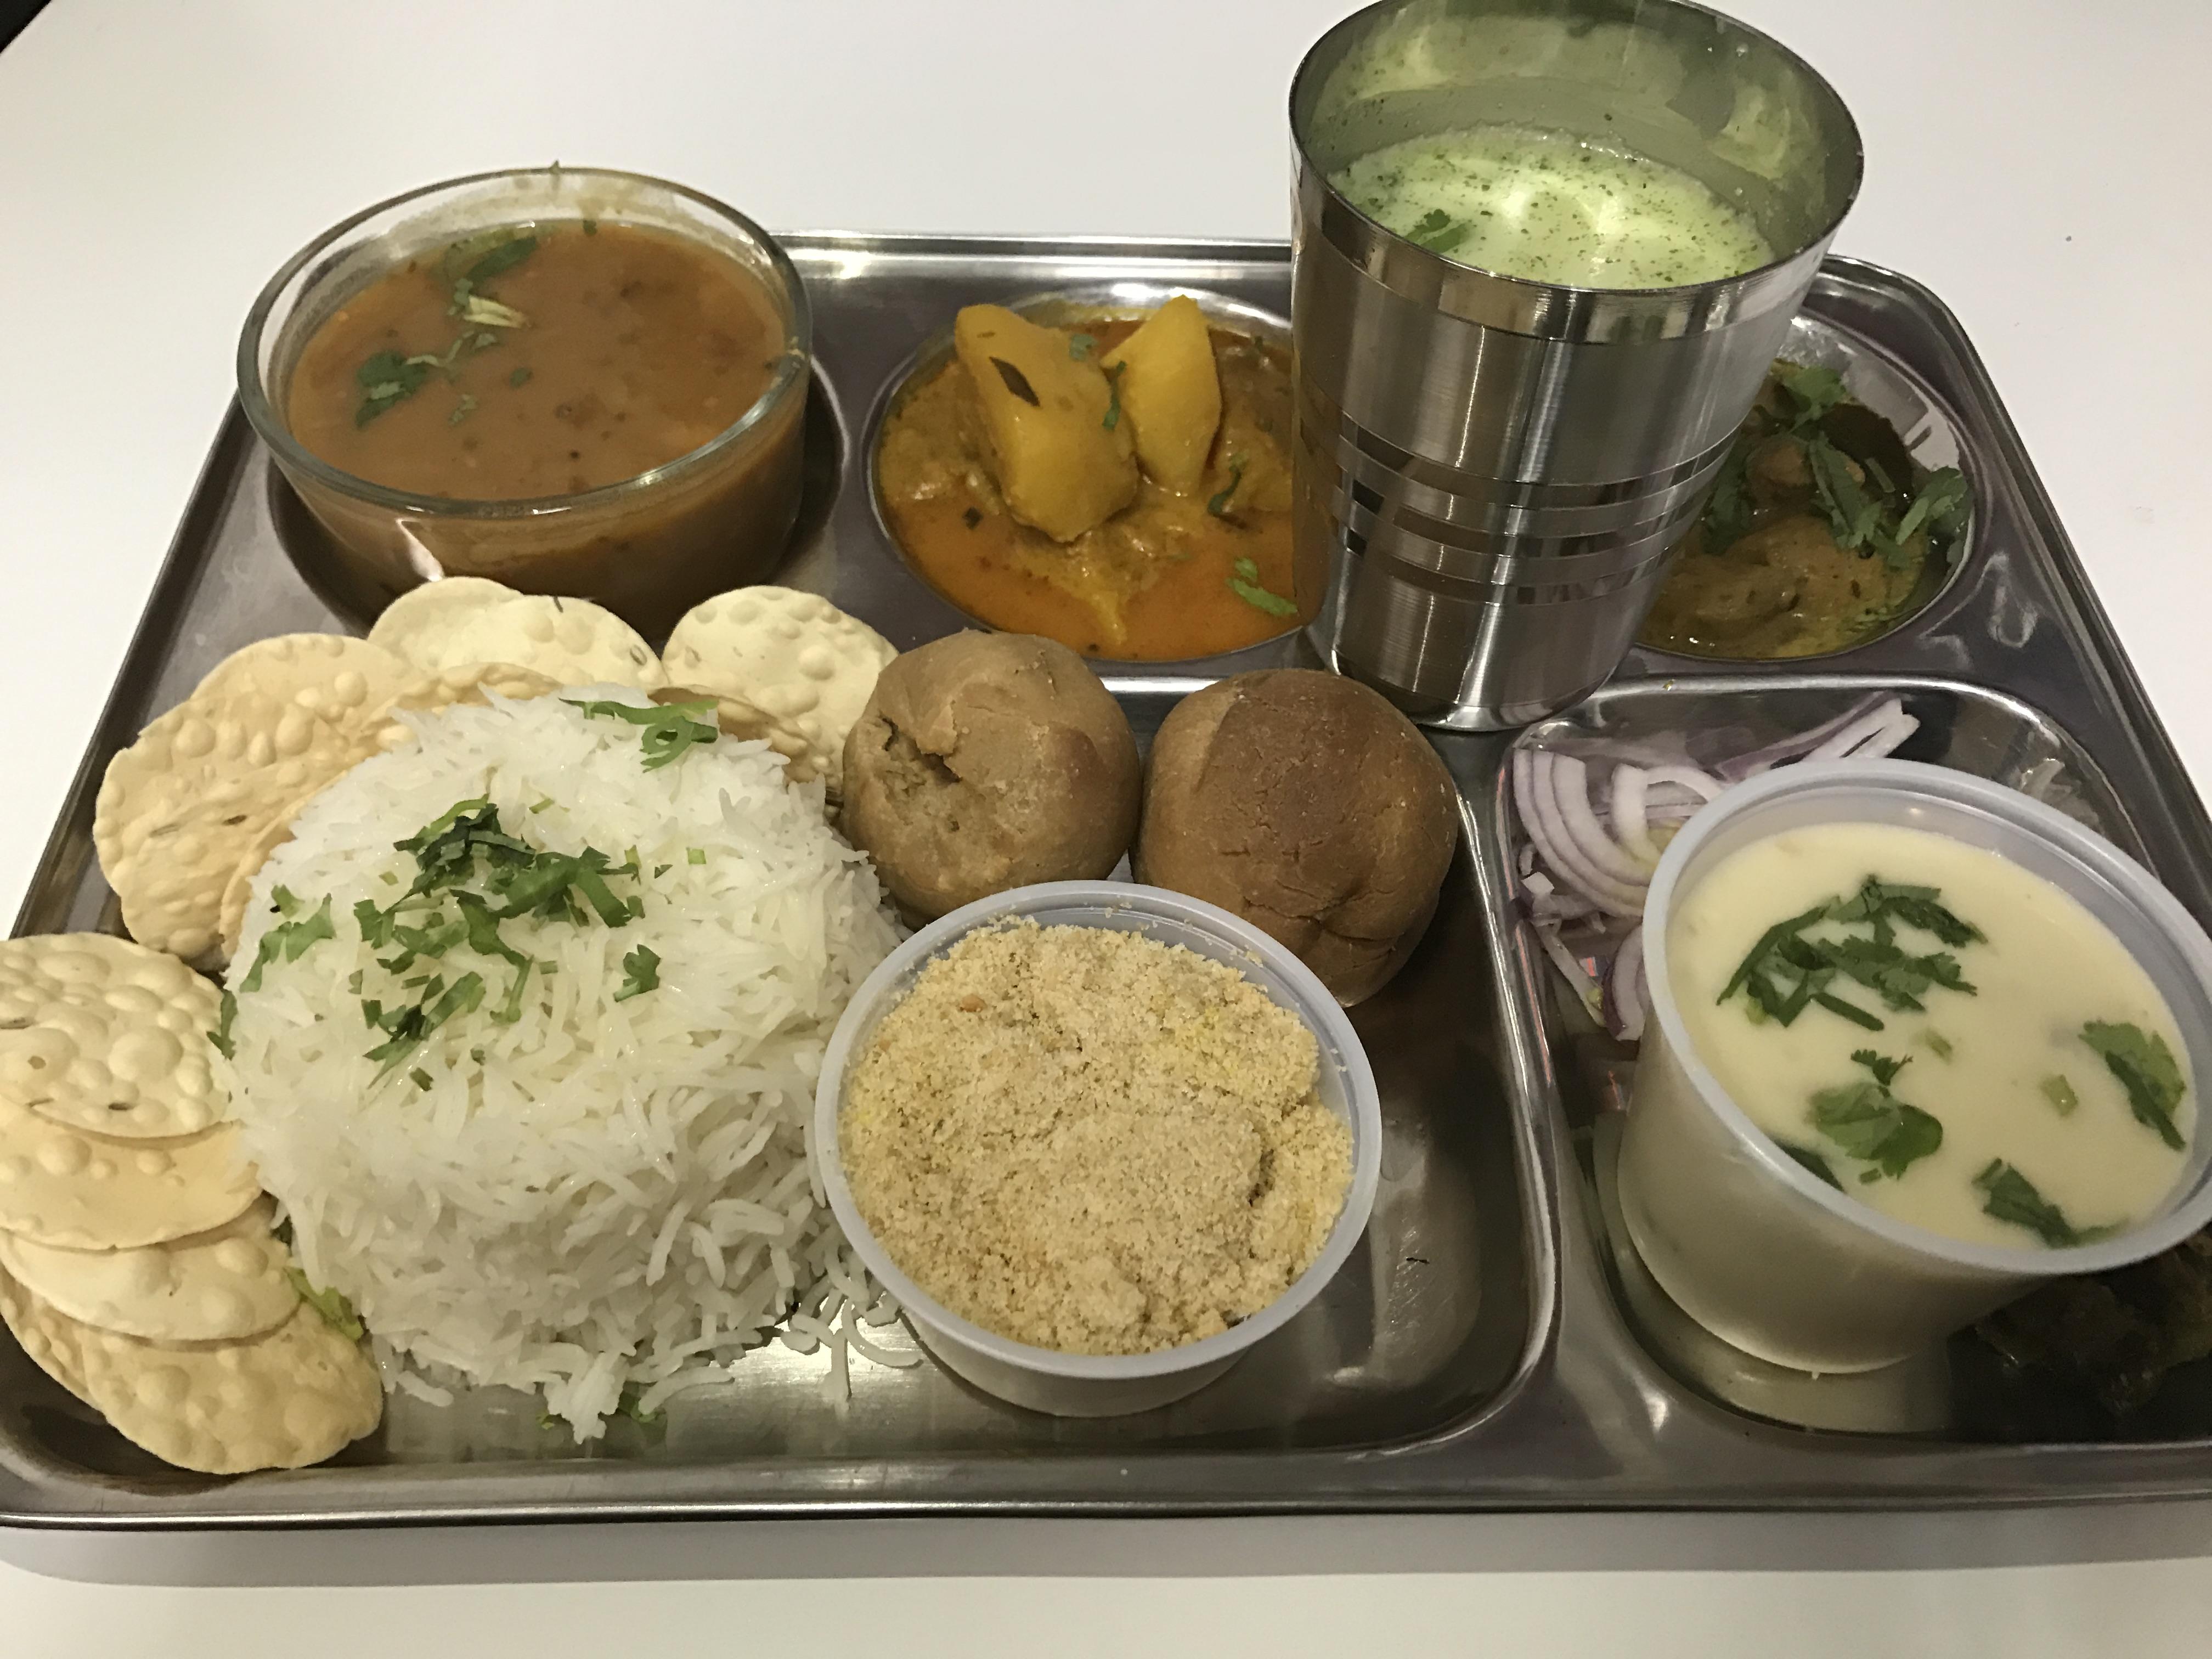 Rajasthani Thali with Daal, Baati, Choorma and Rice